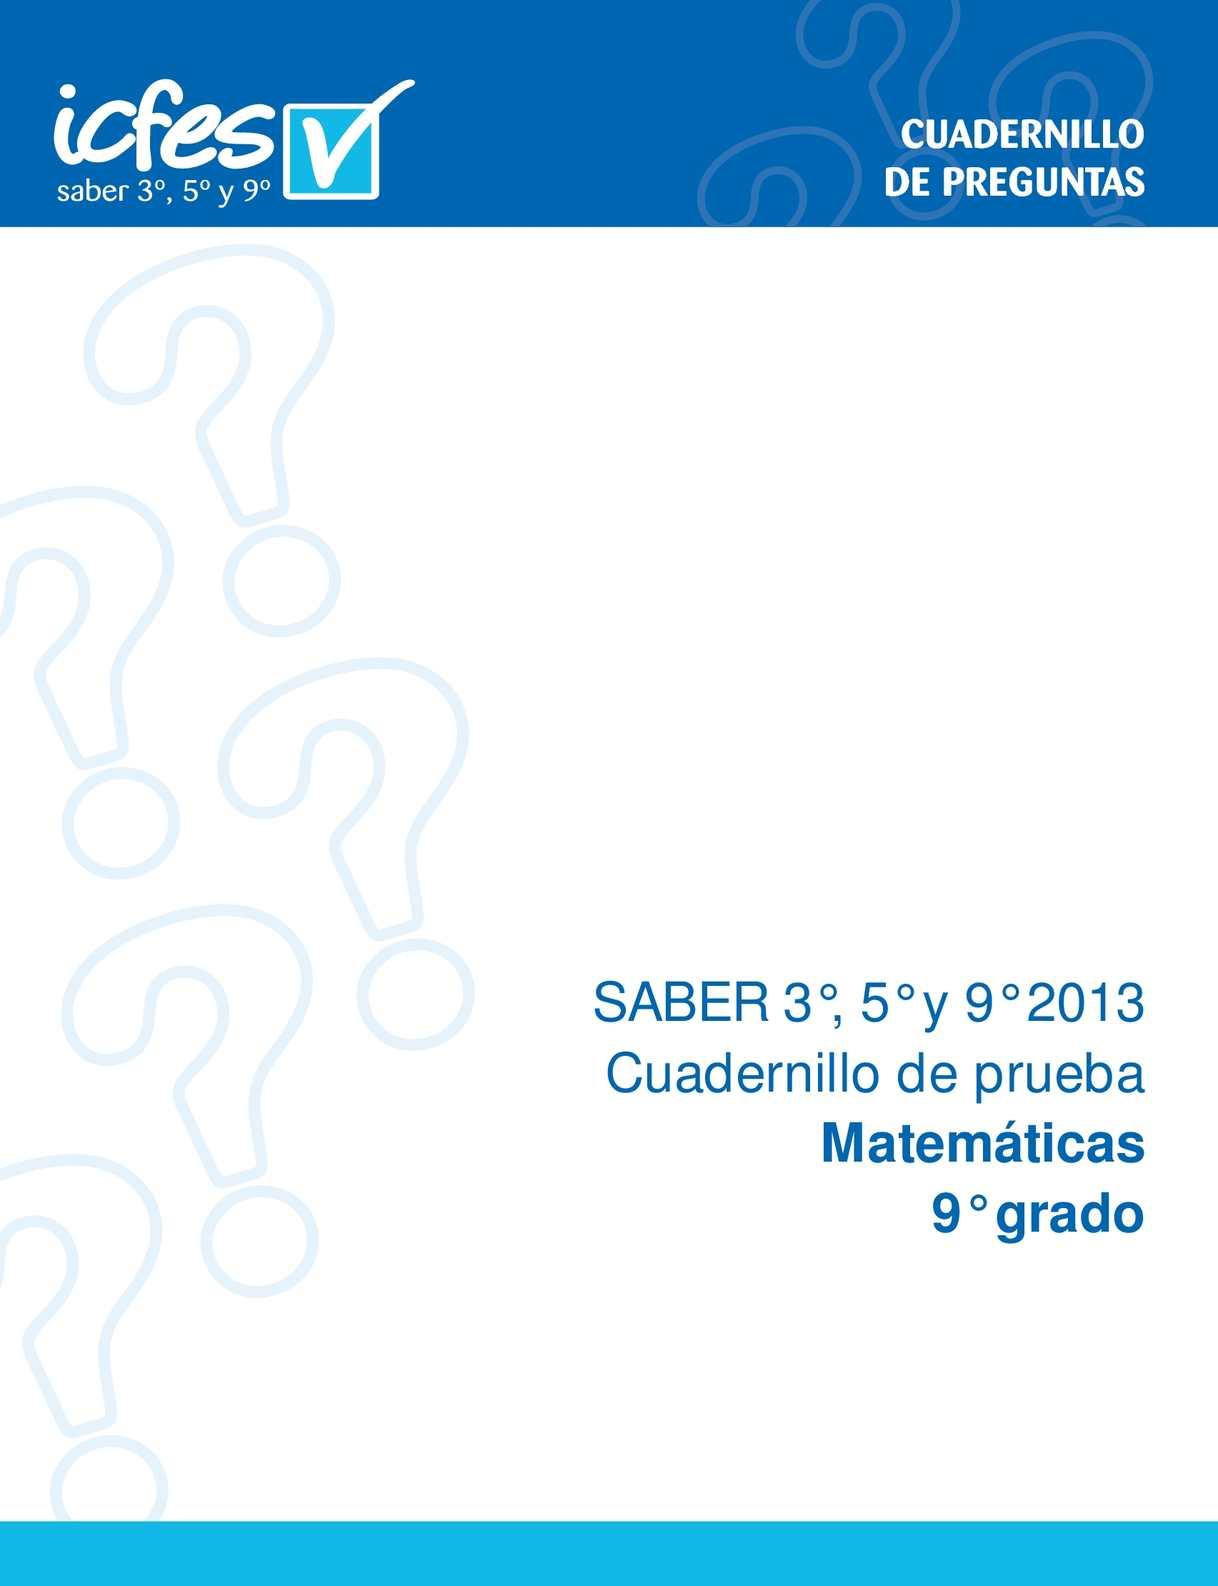 CUADERNILLO SABER 9- ICFES 2013